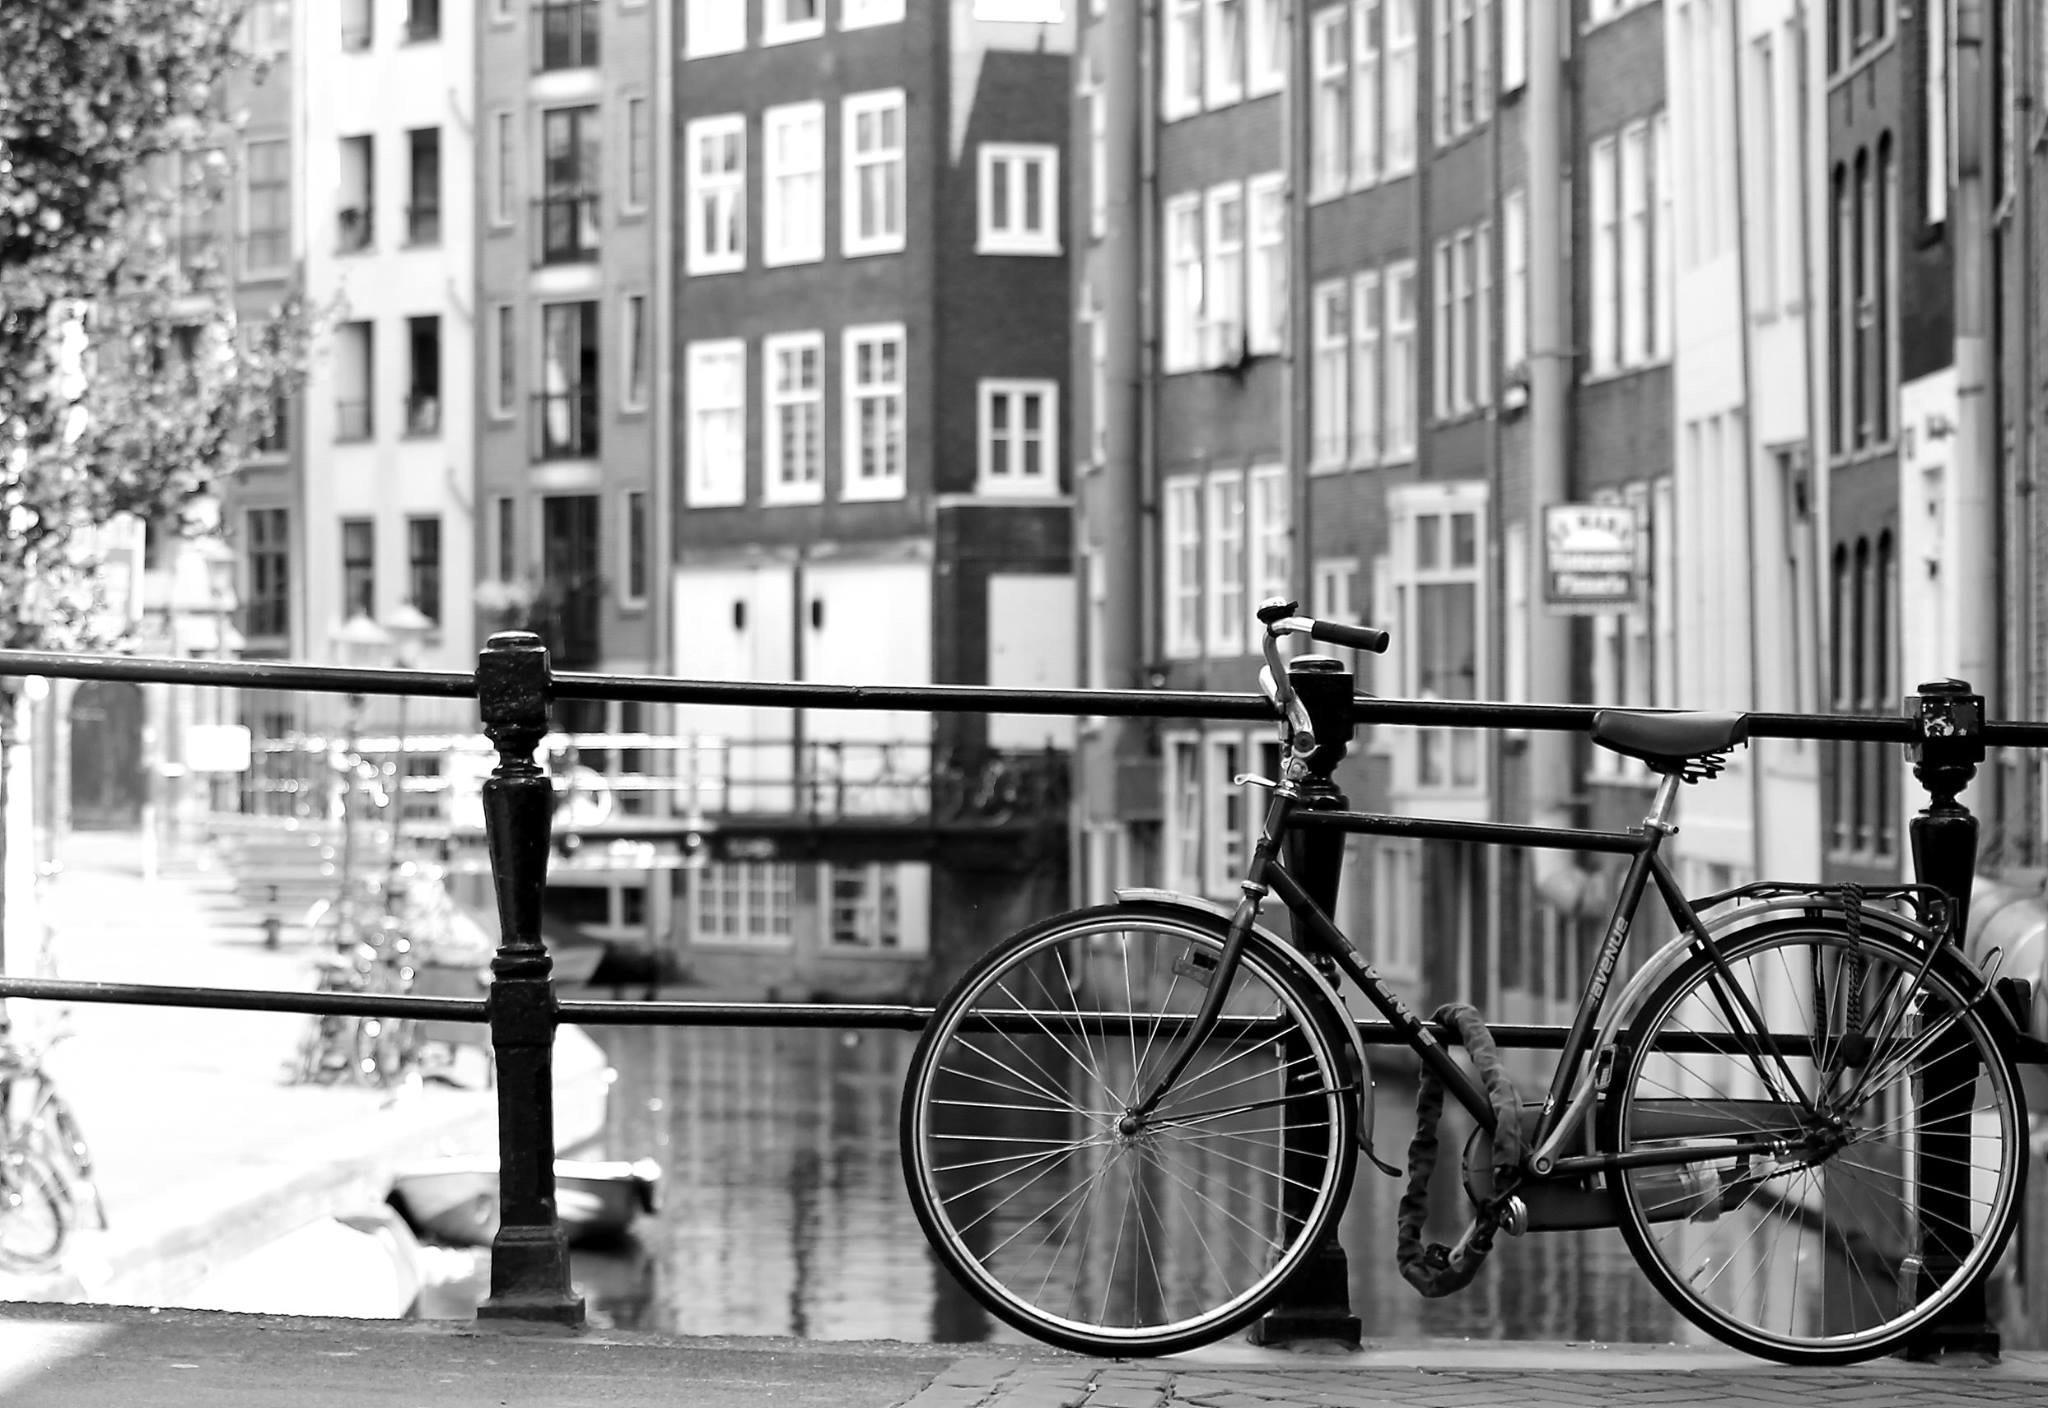 Amsterdam bicycle capital ......